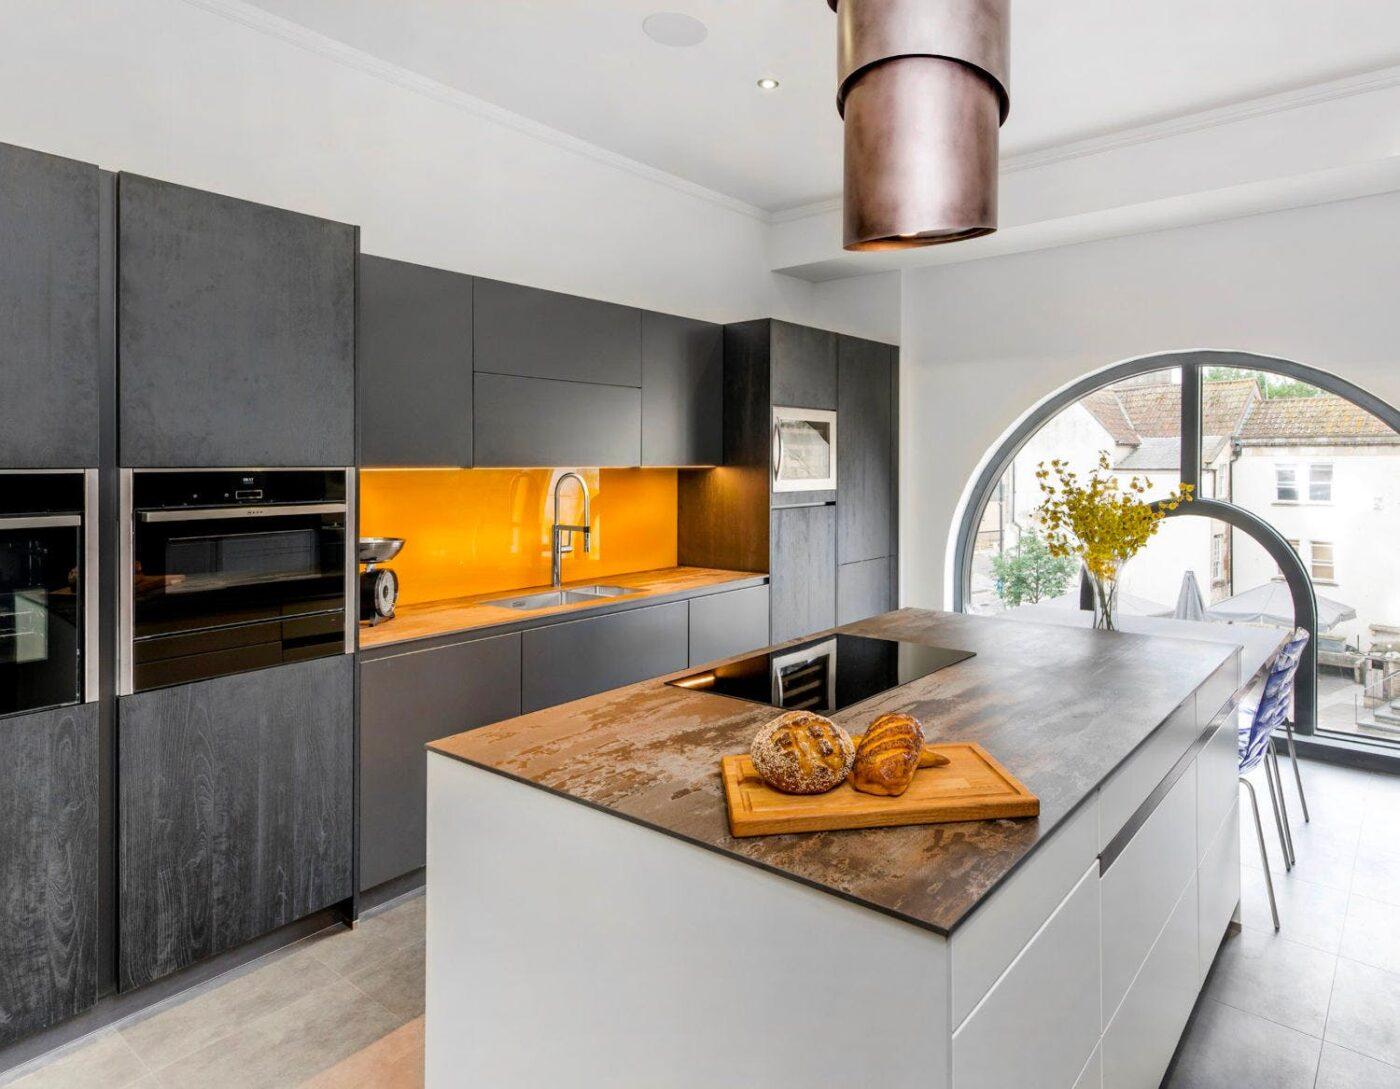 Modular kitchens: practical and versatile